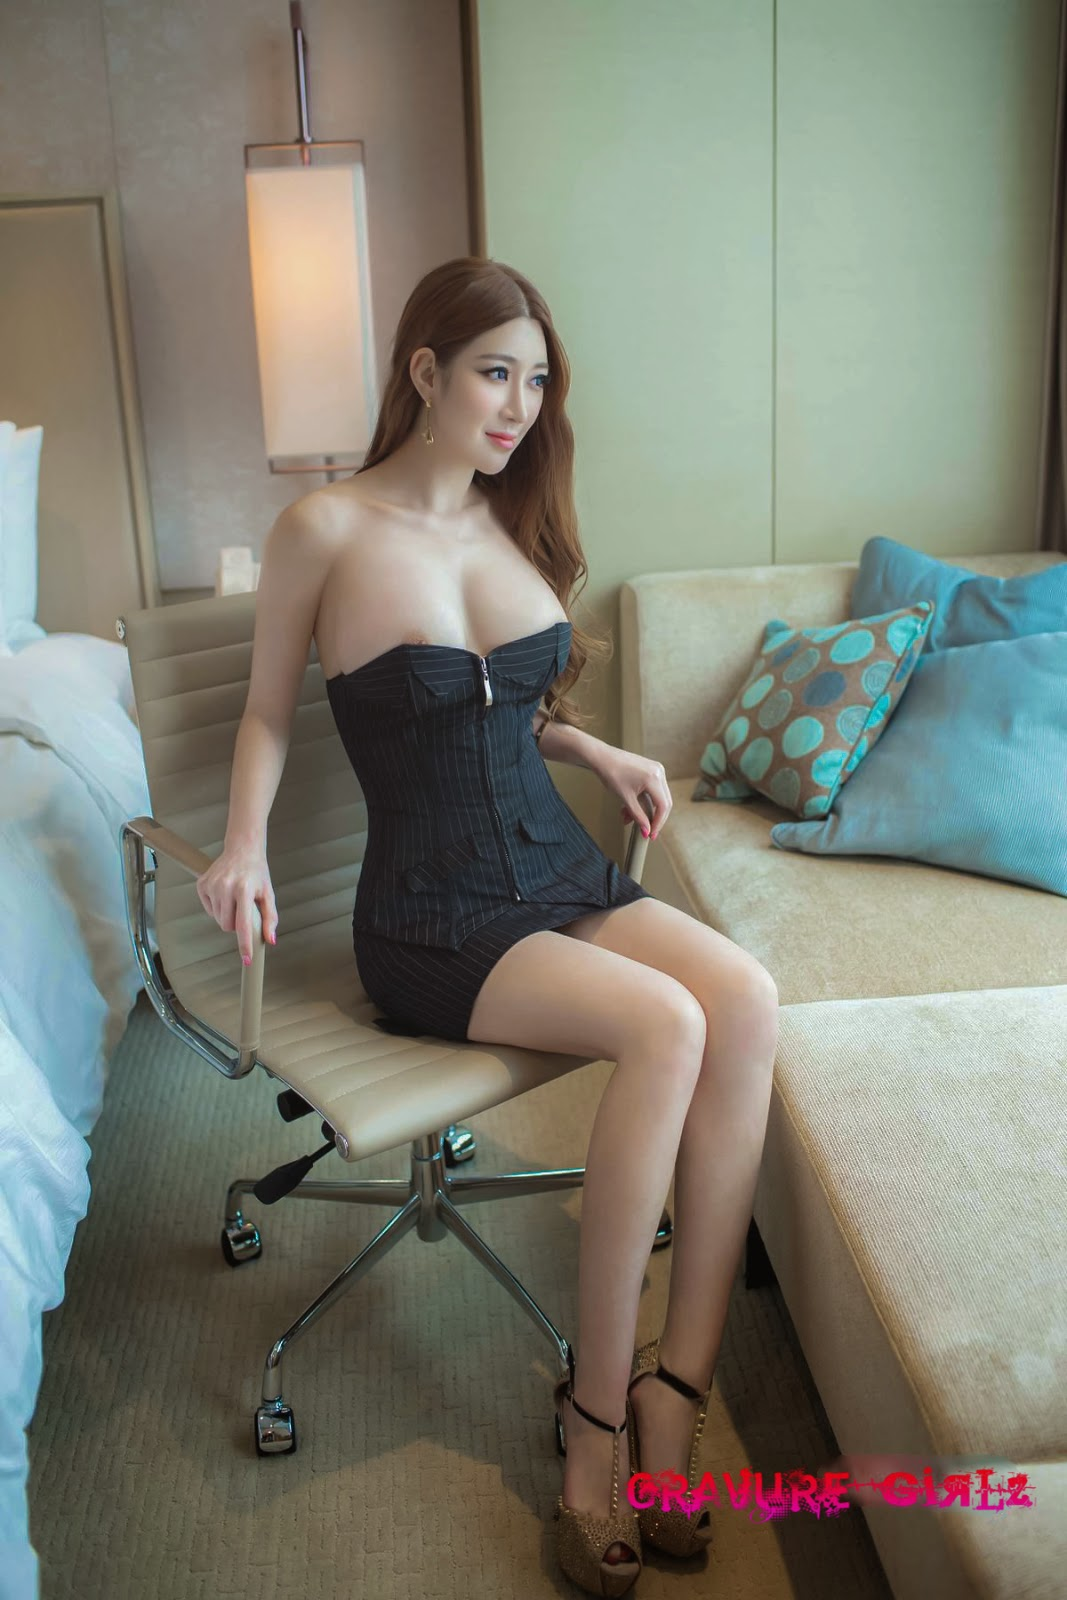 Girls bing chinese nude